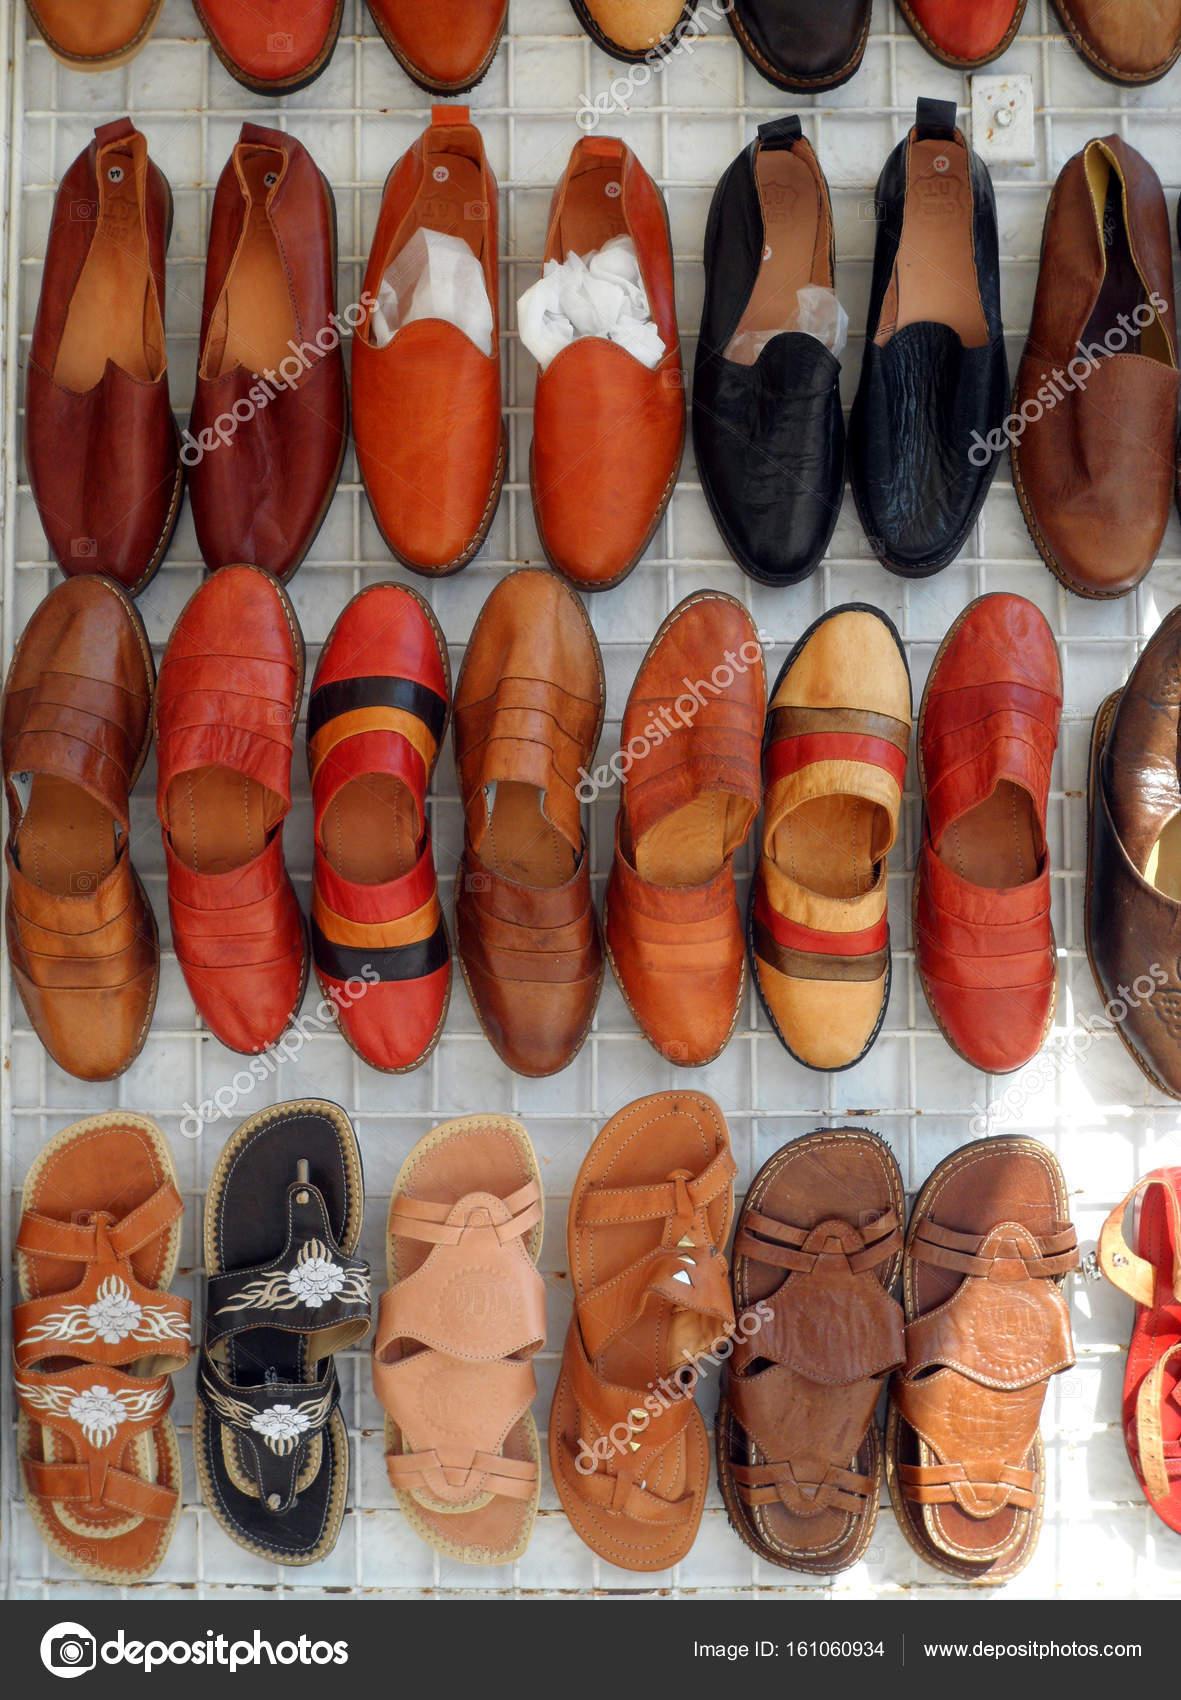 Cuir Marché Sandales En De Stand qGUMpSzV